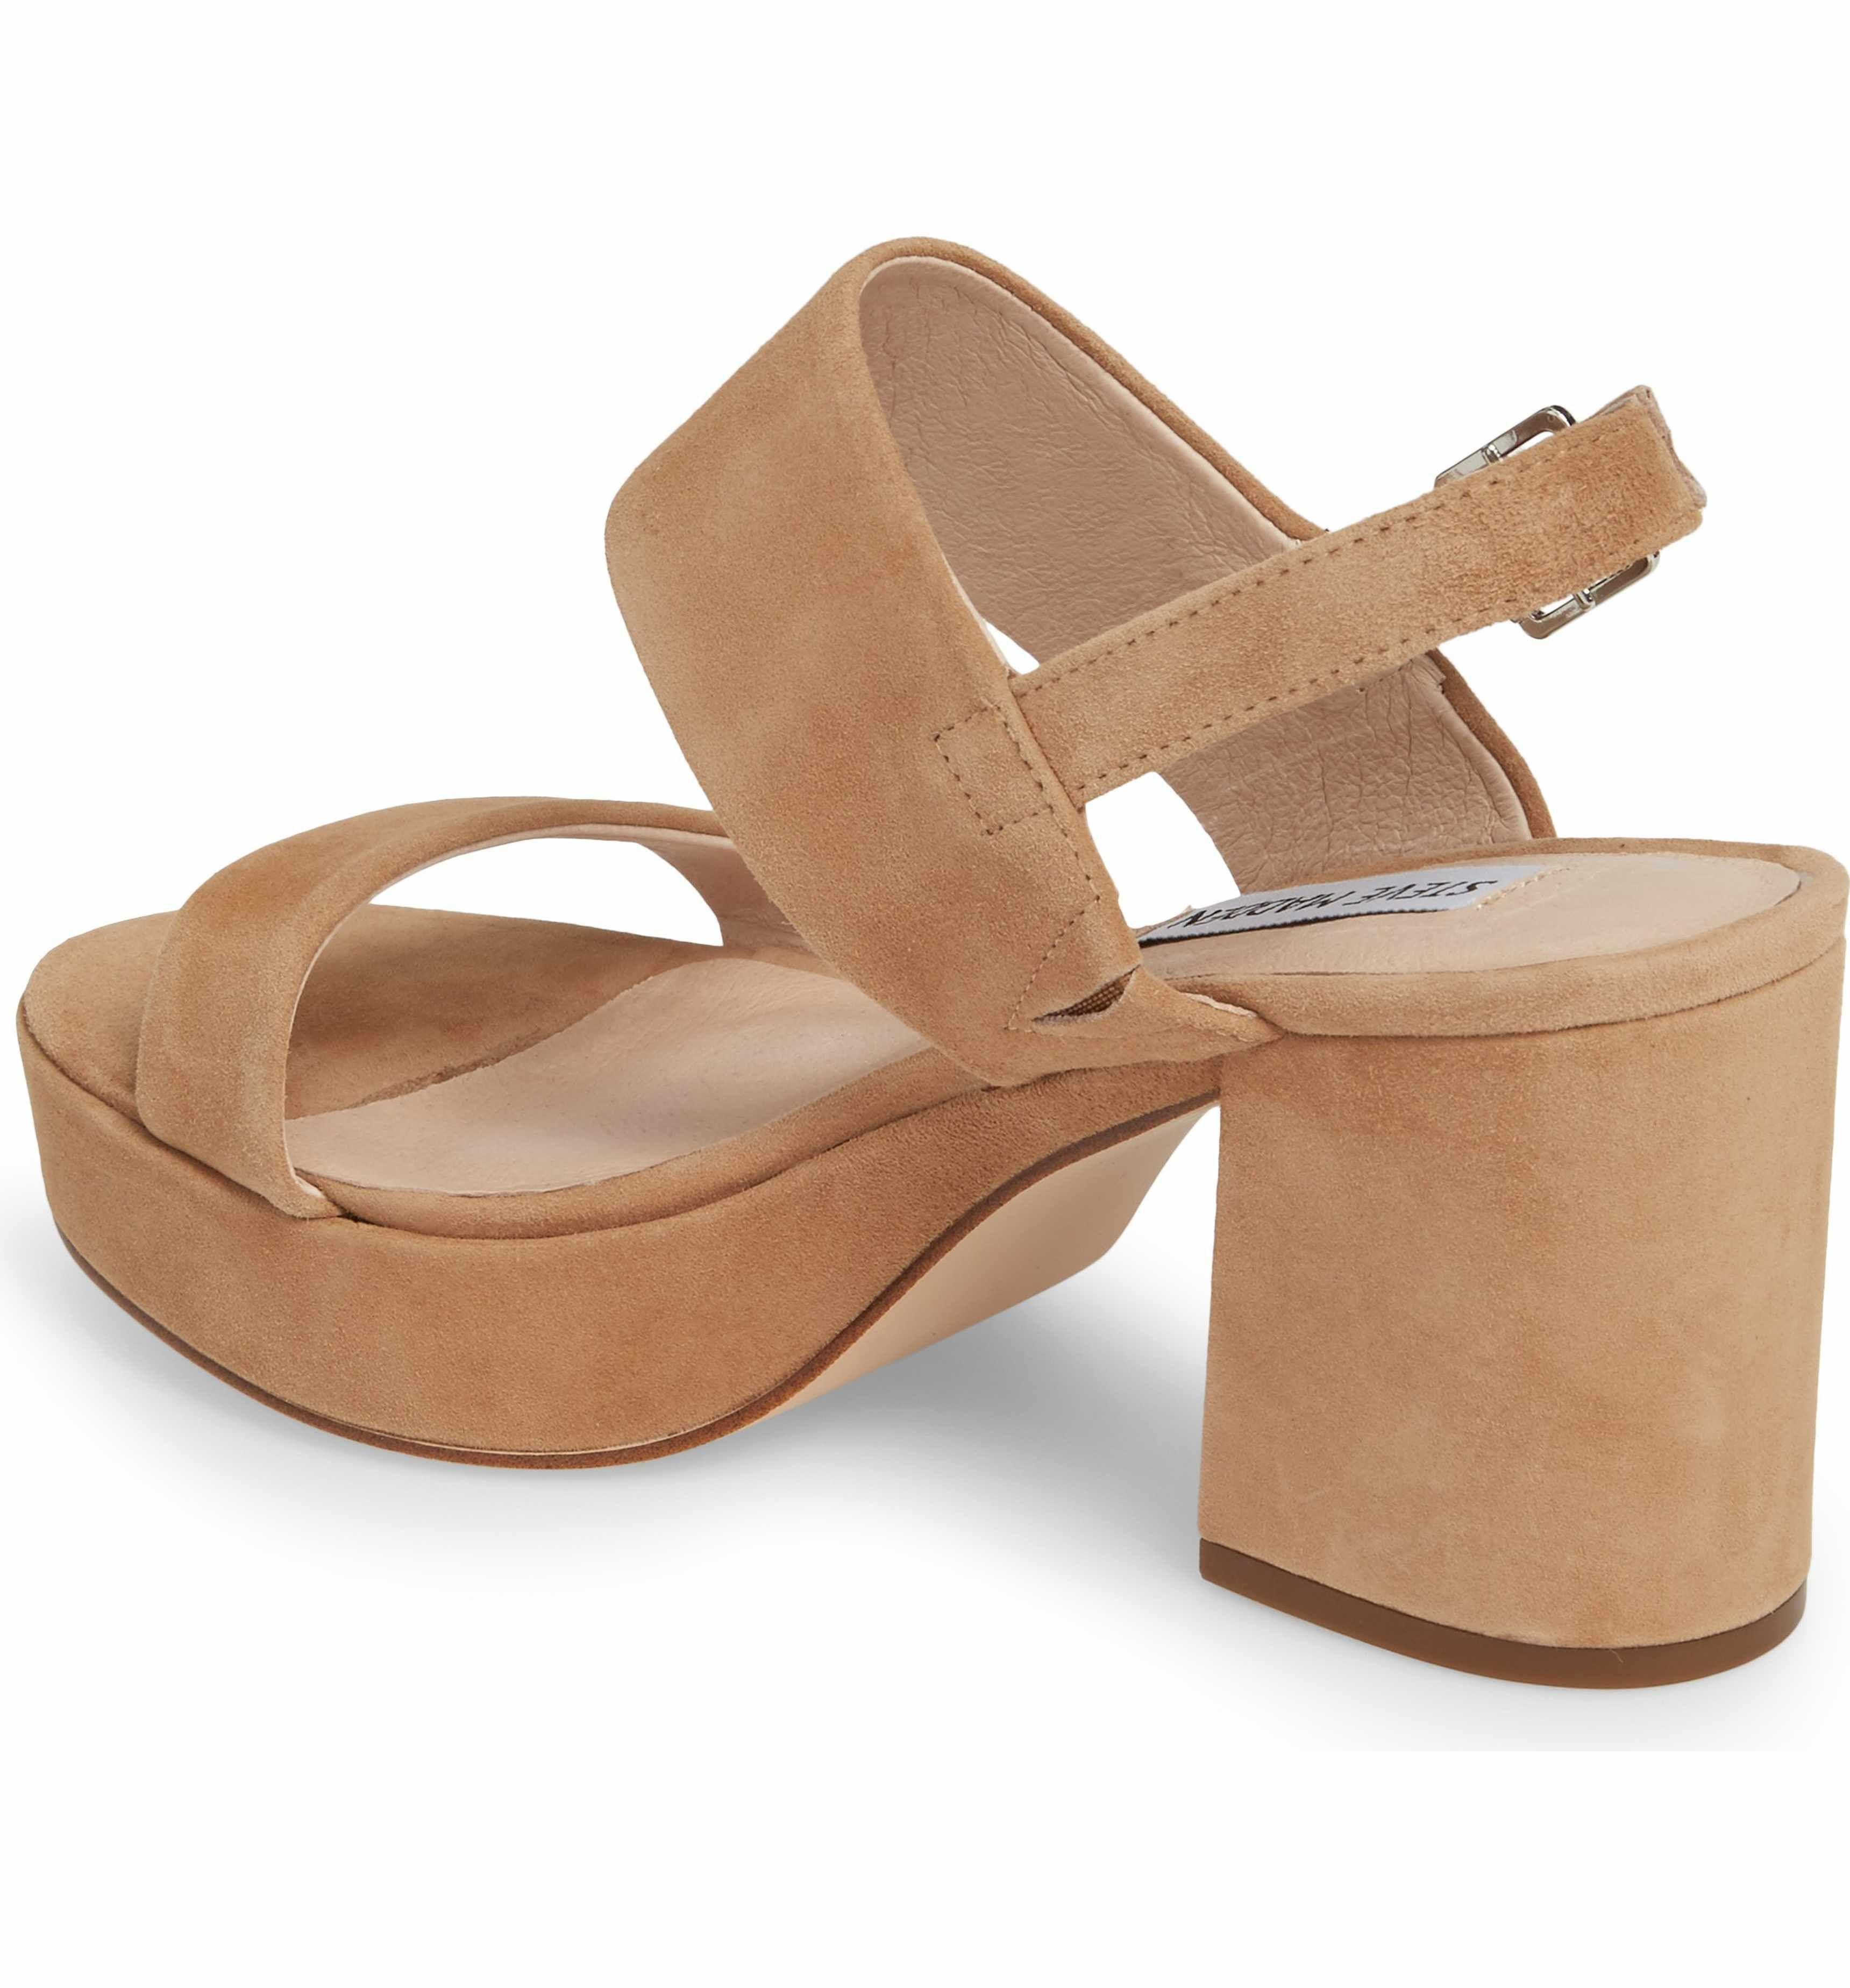 59954020cce1 Main Image - Steve Madden Reba Slingback Platform Sandal (Women ...